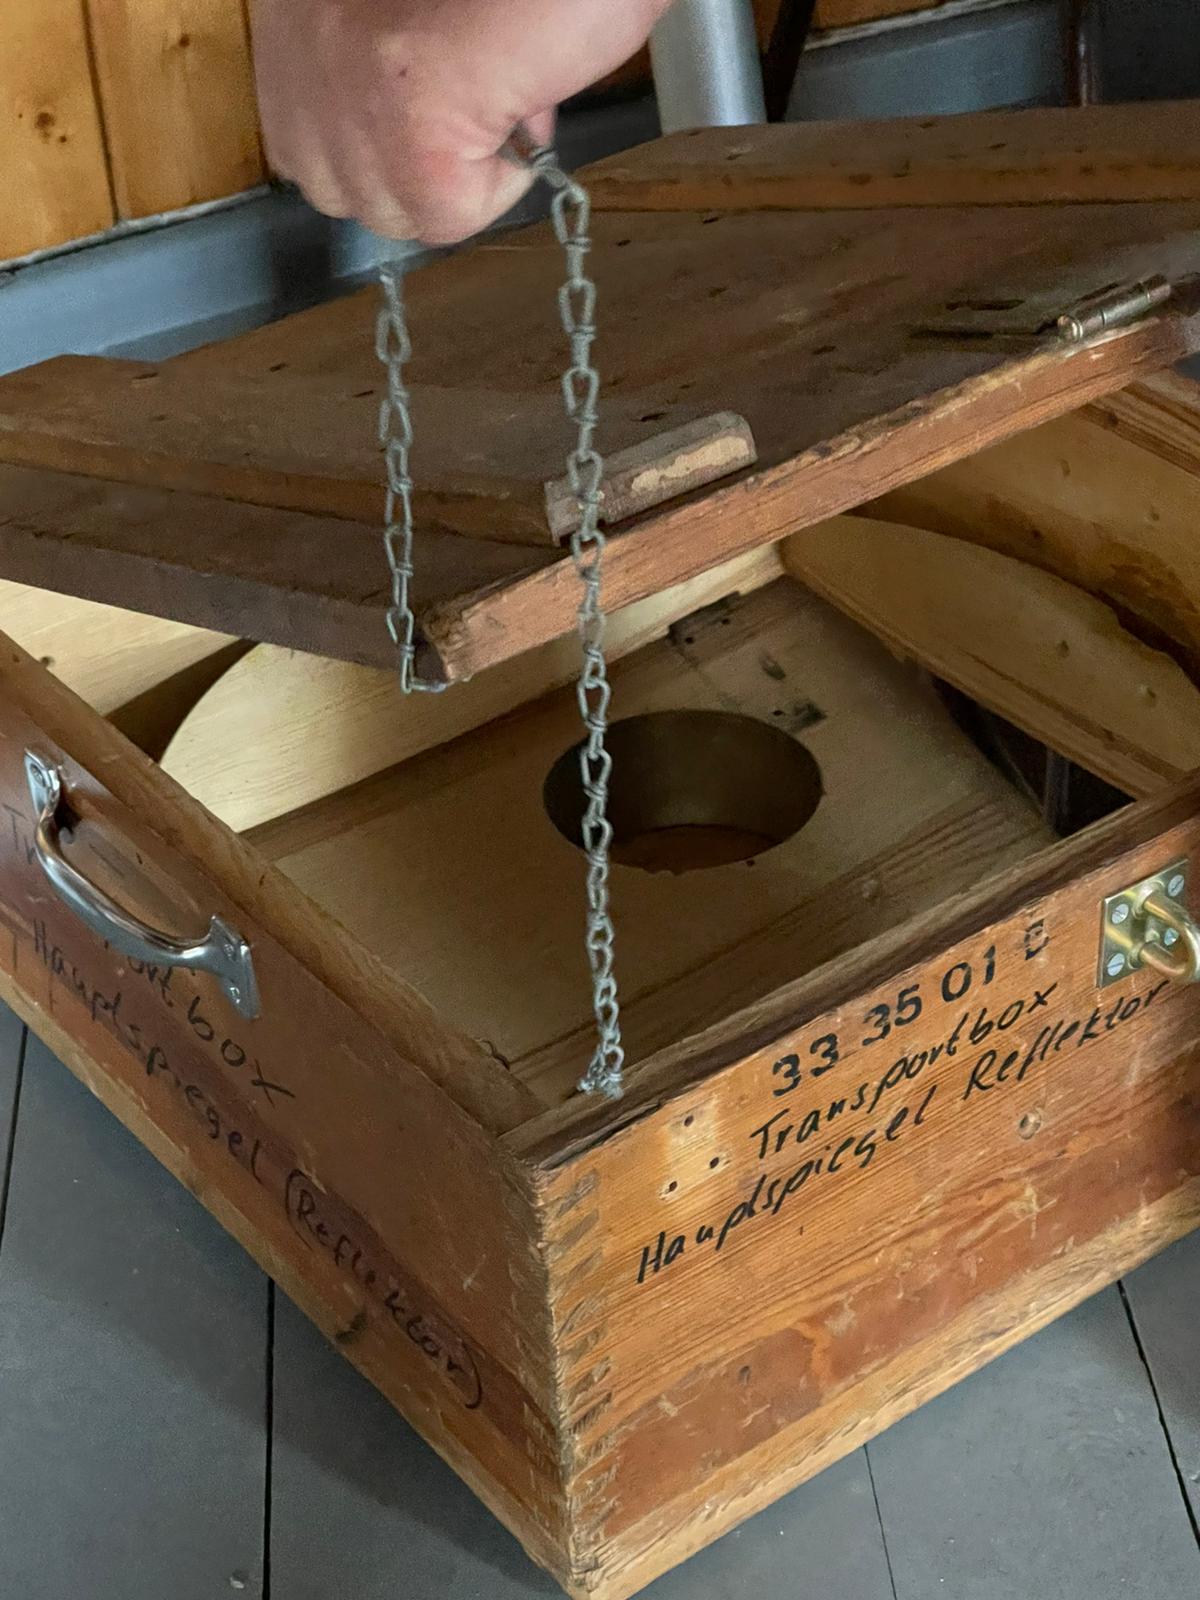 Zeiss-Hauptspiegel in Transportbox